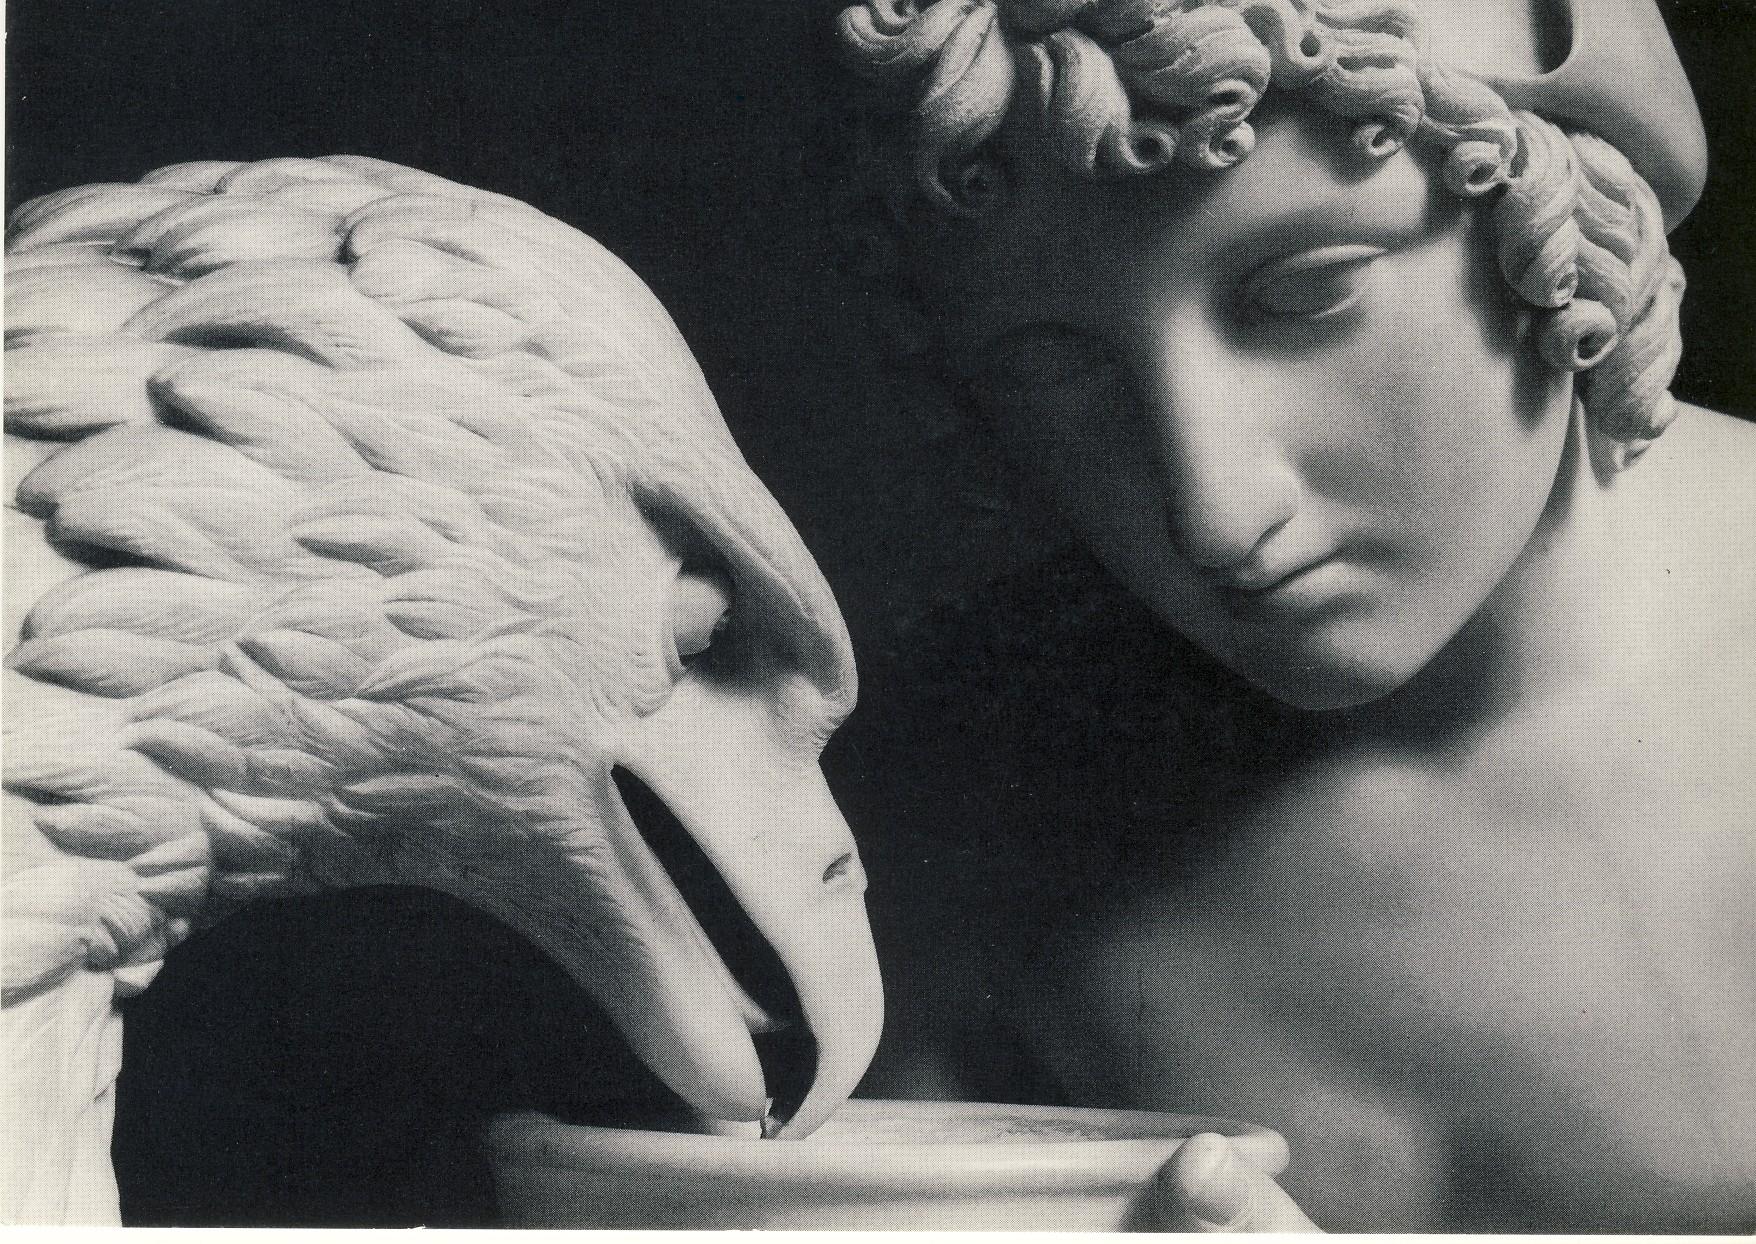 B. THORWALDSEN,Ganimede con l'aquila di Giove (part), 1817, marmo, h.93,3 cm., Copenaghen, Museo Bertel Thorwaldsen